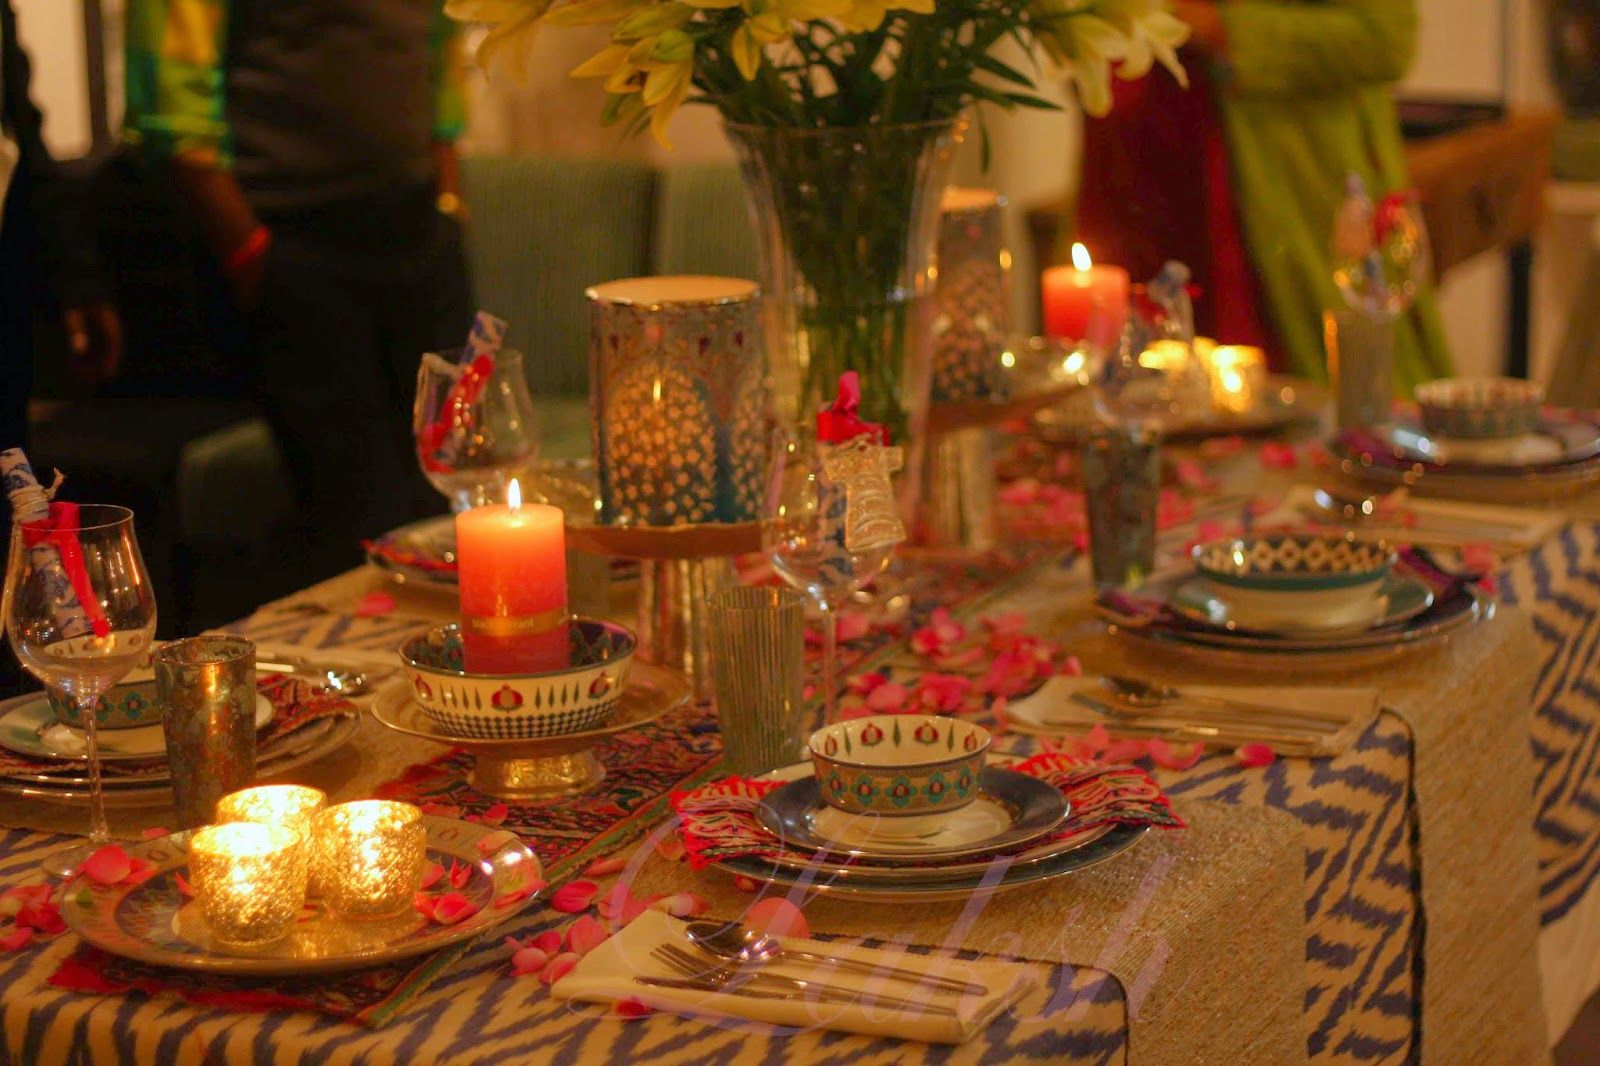 Celebrations Decor An Indian Decor Blog Dinner Table Decor Dining Table Decor Decorating Blogs